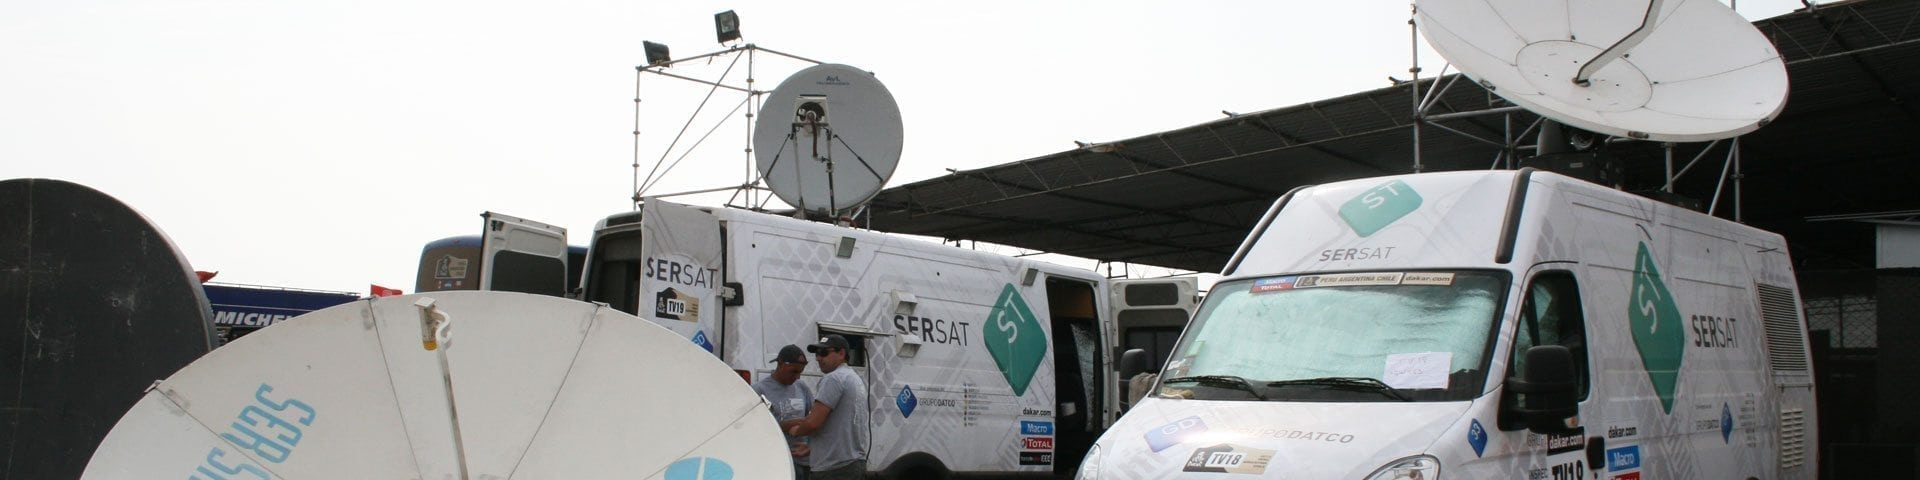 3 dsng camion satelital